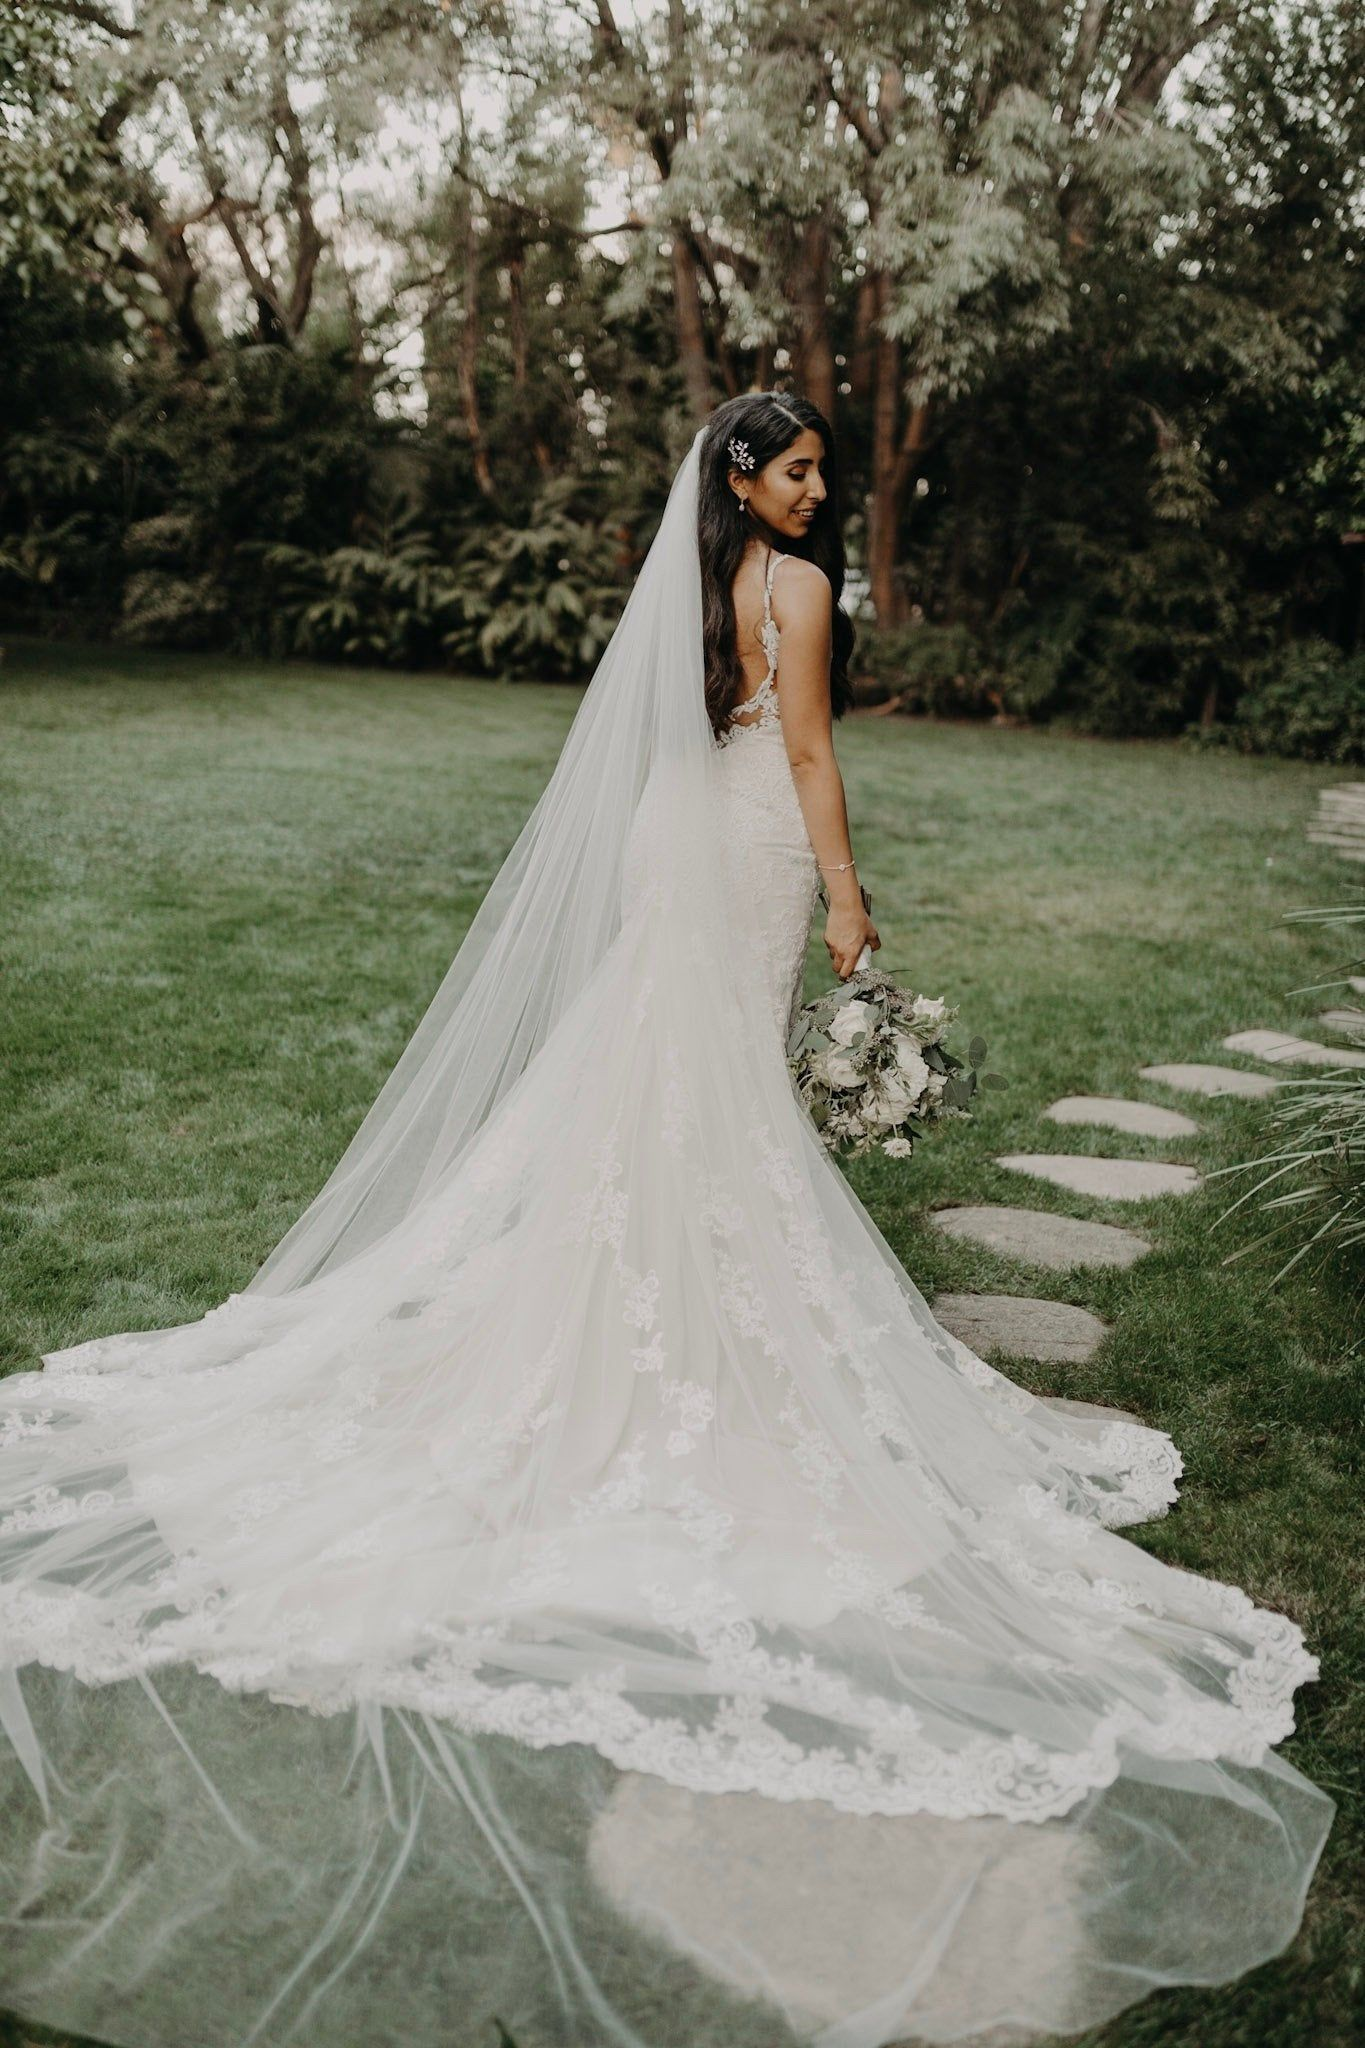 Etsy Cathedral Veil Bridal Wedding Veil White Ivory Diamond Etsy In 2021 Wedding Bridal Veils Cathedral Bridal Veils Elegant Bridal Veils [ 2048 x 1365 Pixel ]